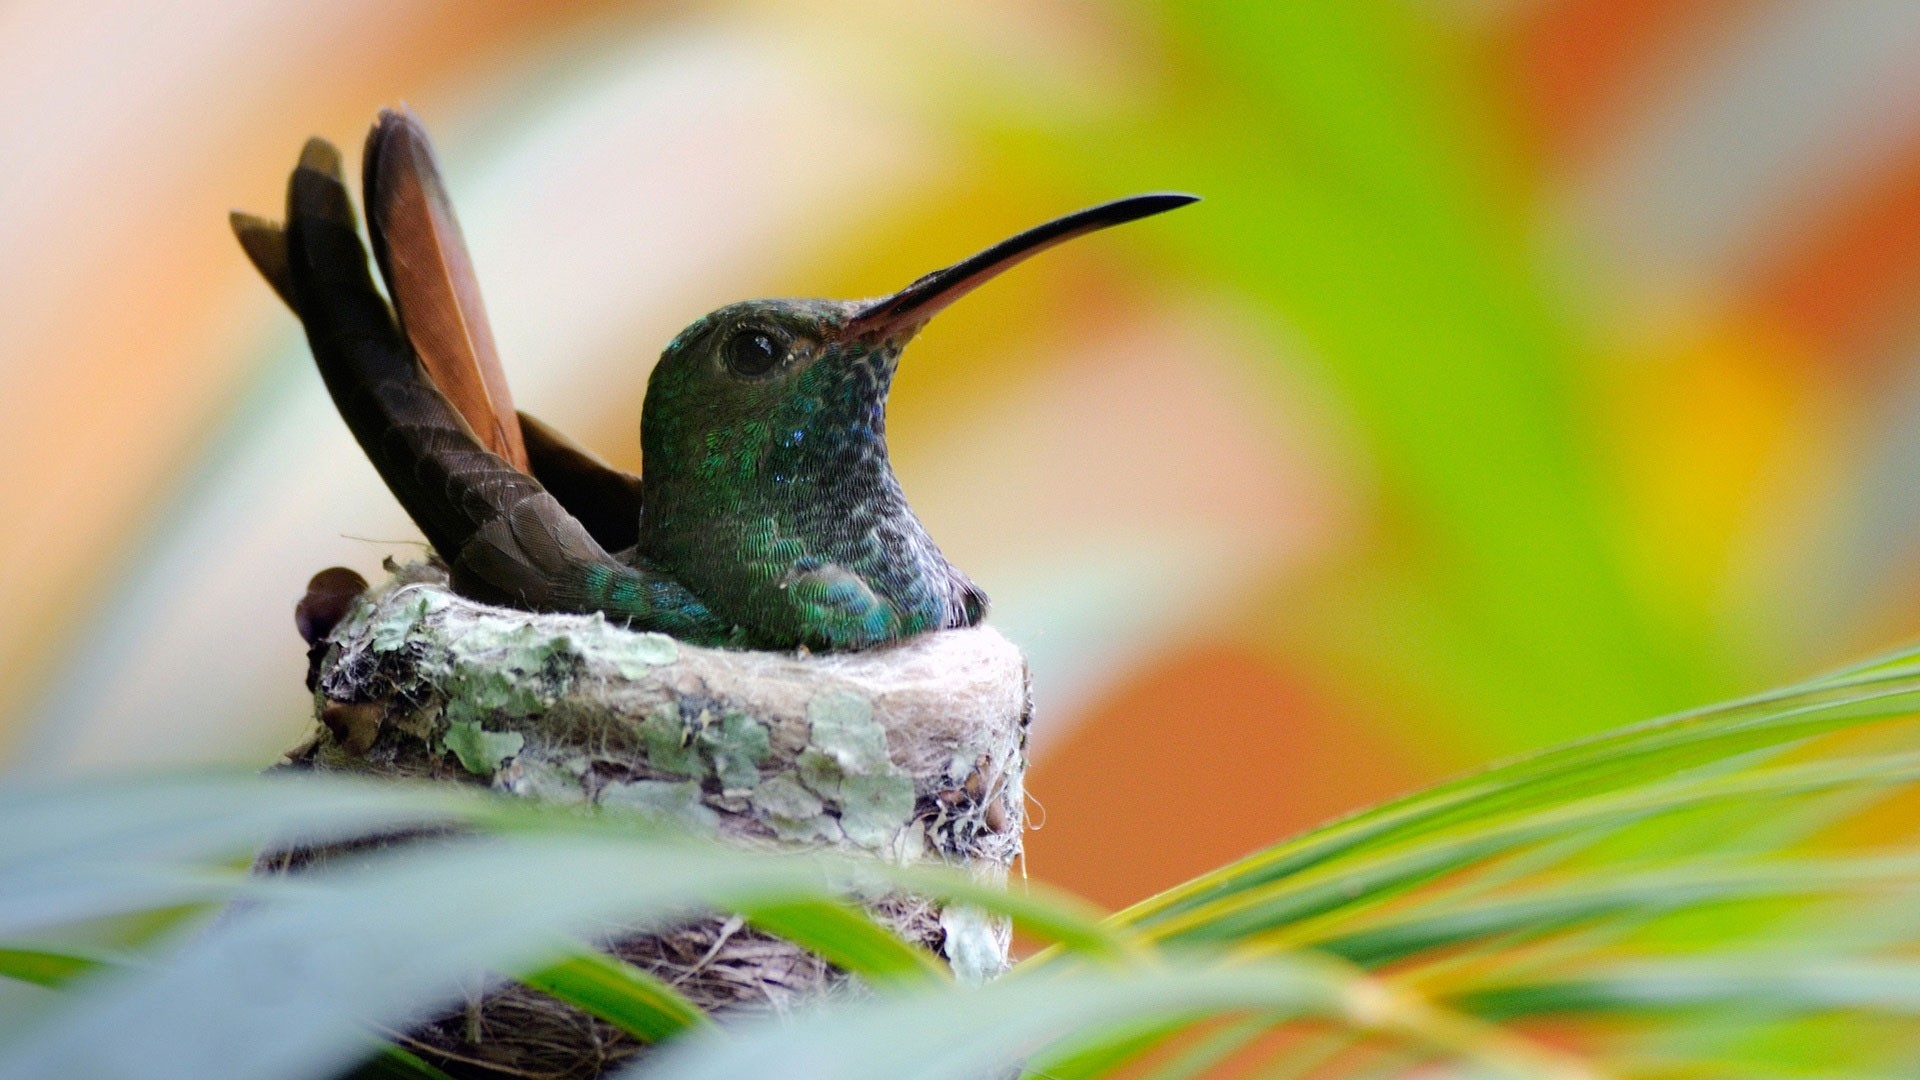 Hummingbird Wallpaper for pc